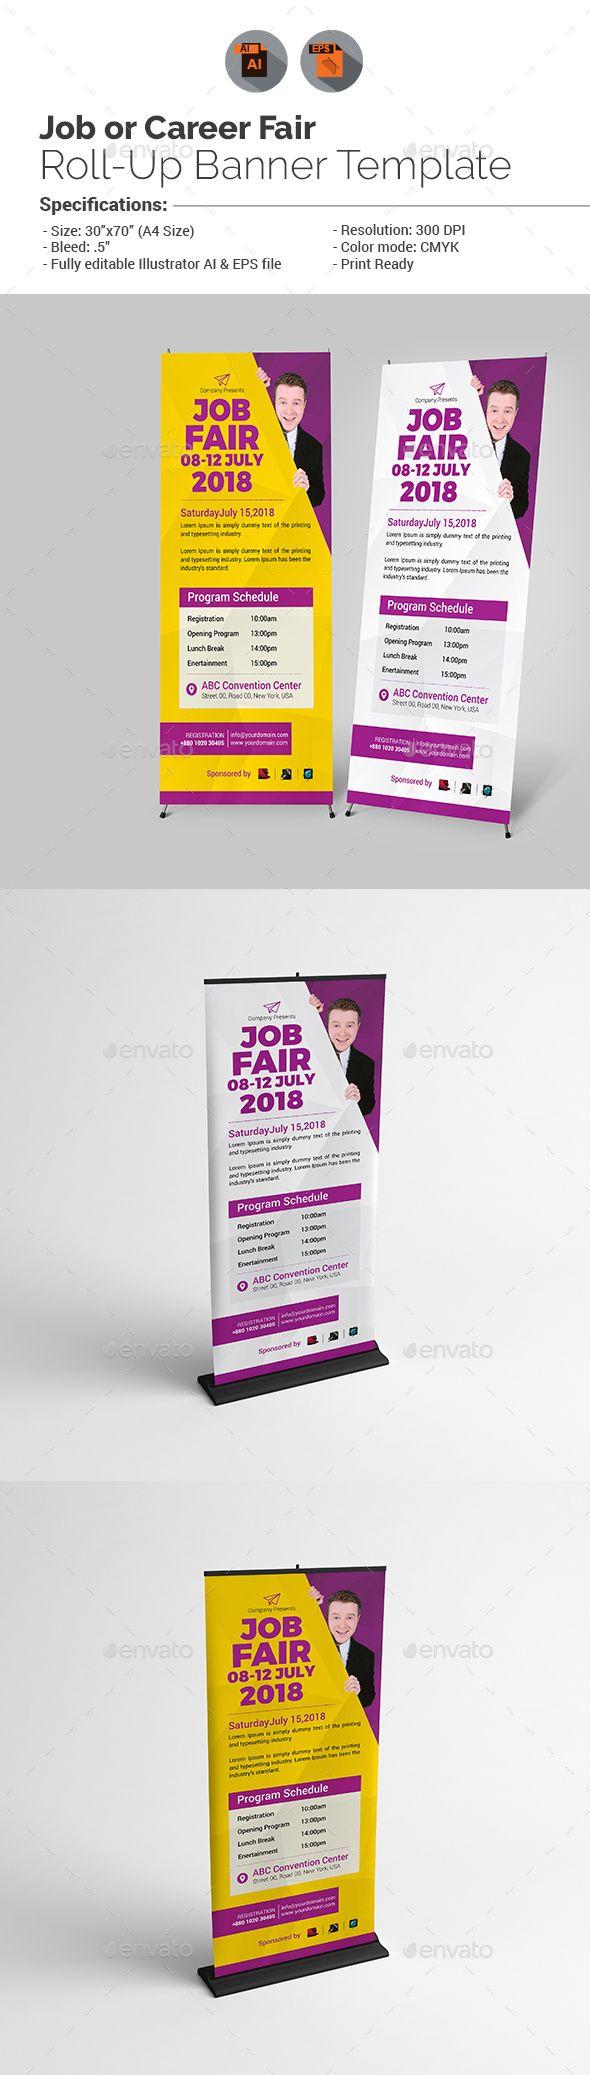 Banner design for job fair - Job Fair Roll Up Banner Template V1